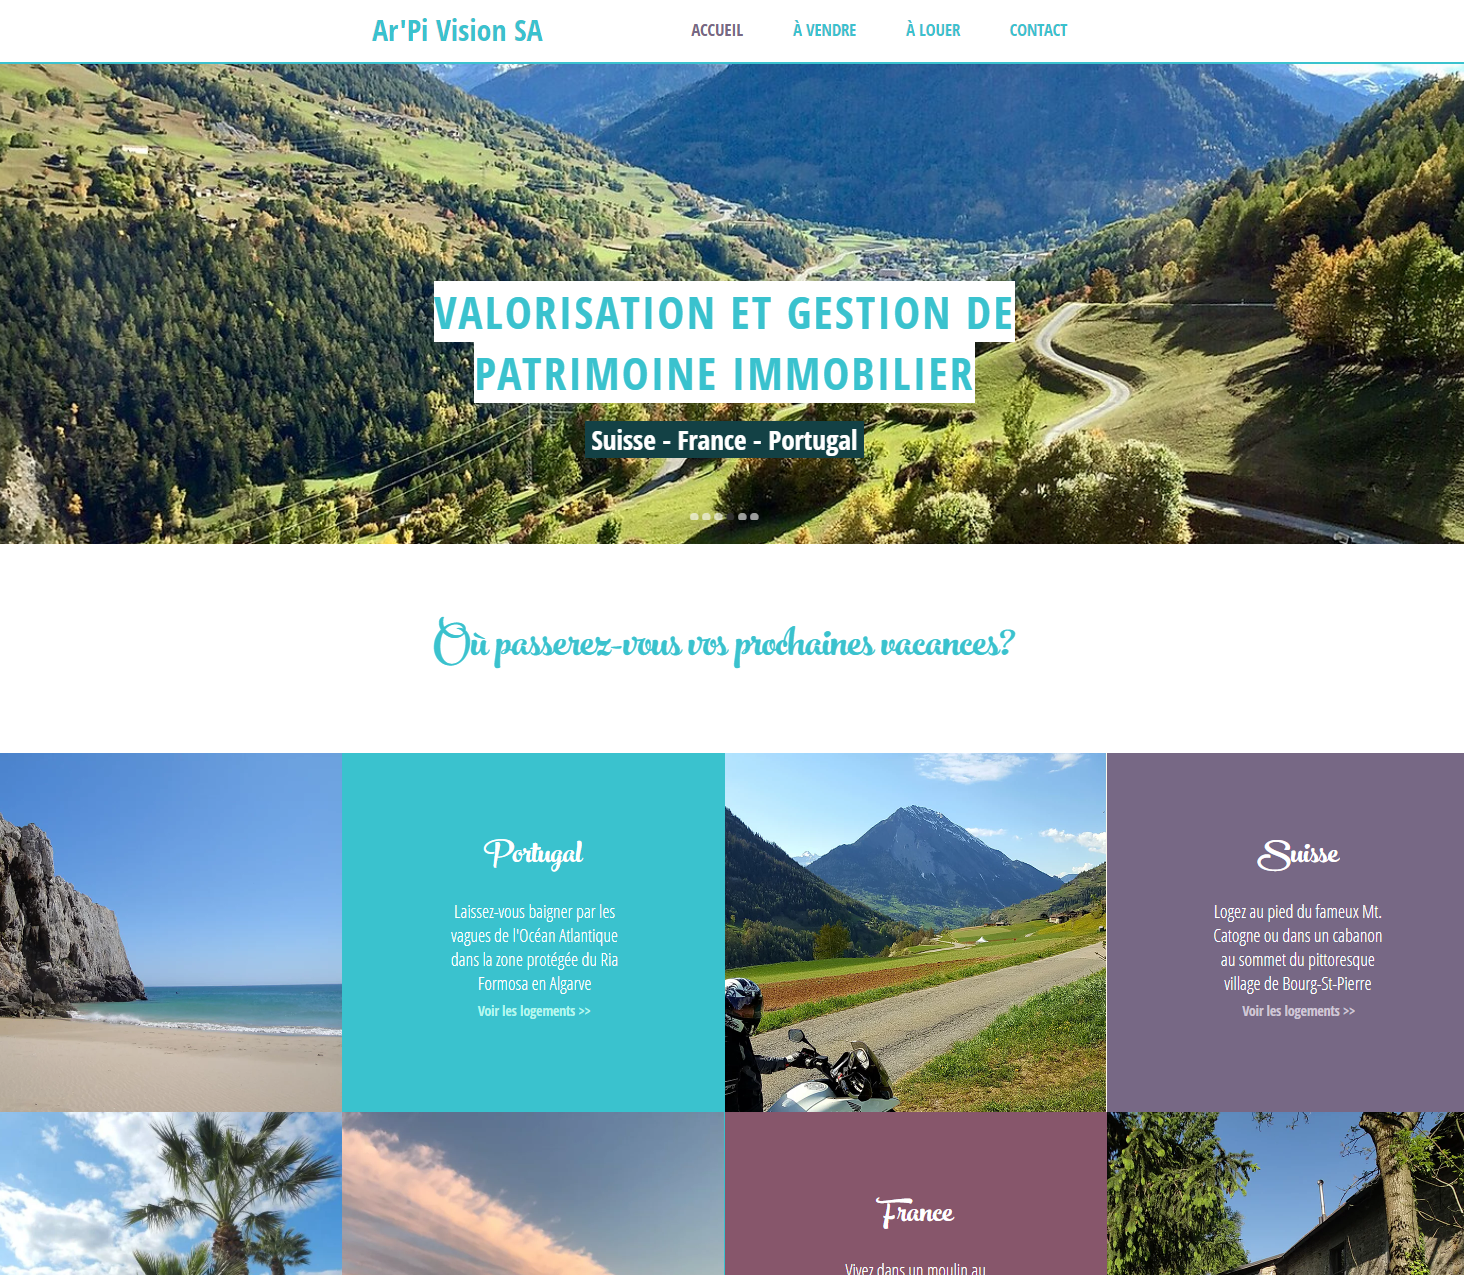 c-webdesign-Arpi-Vision